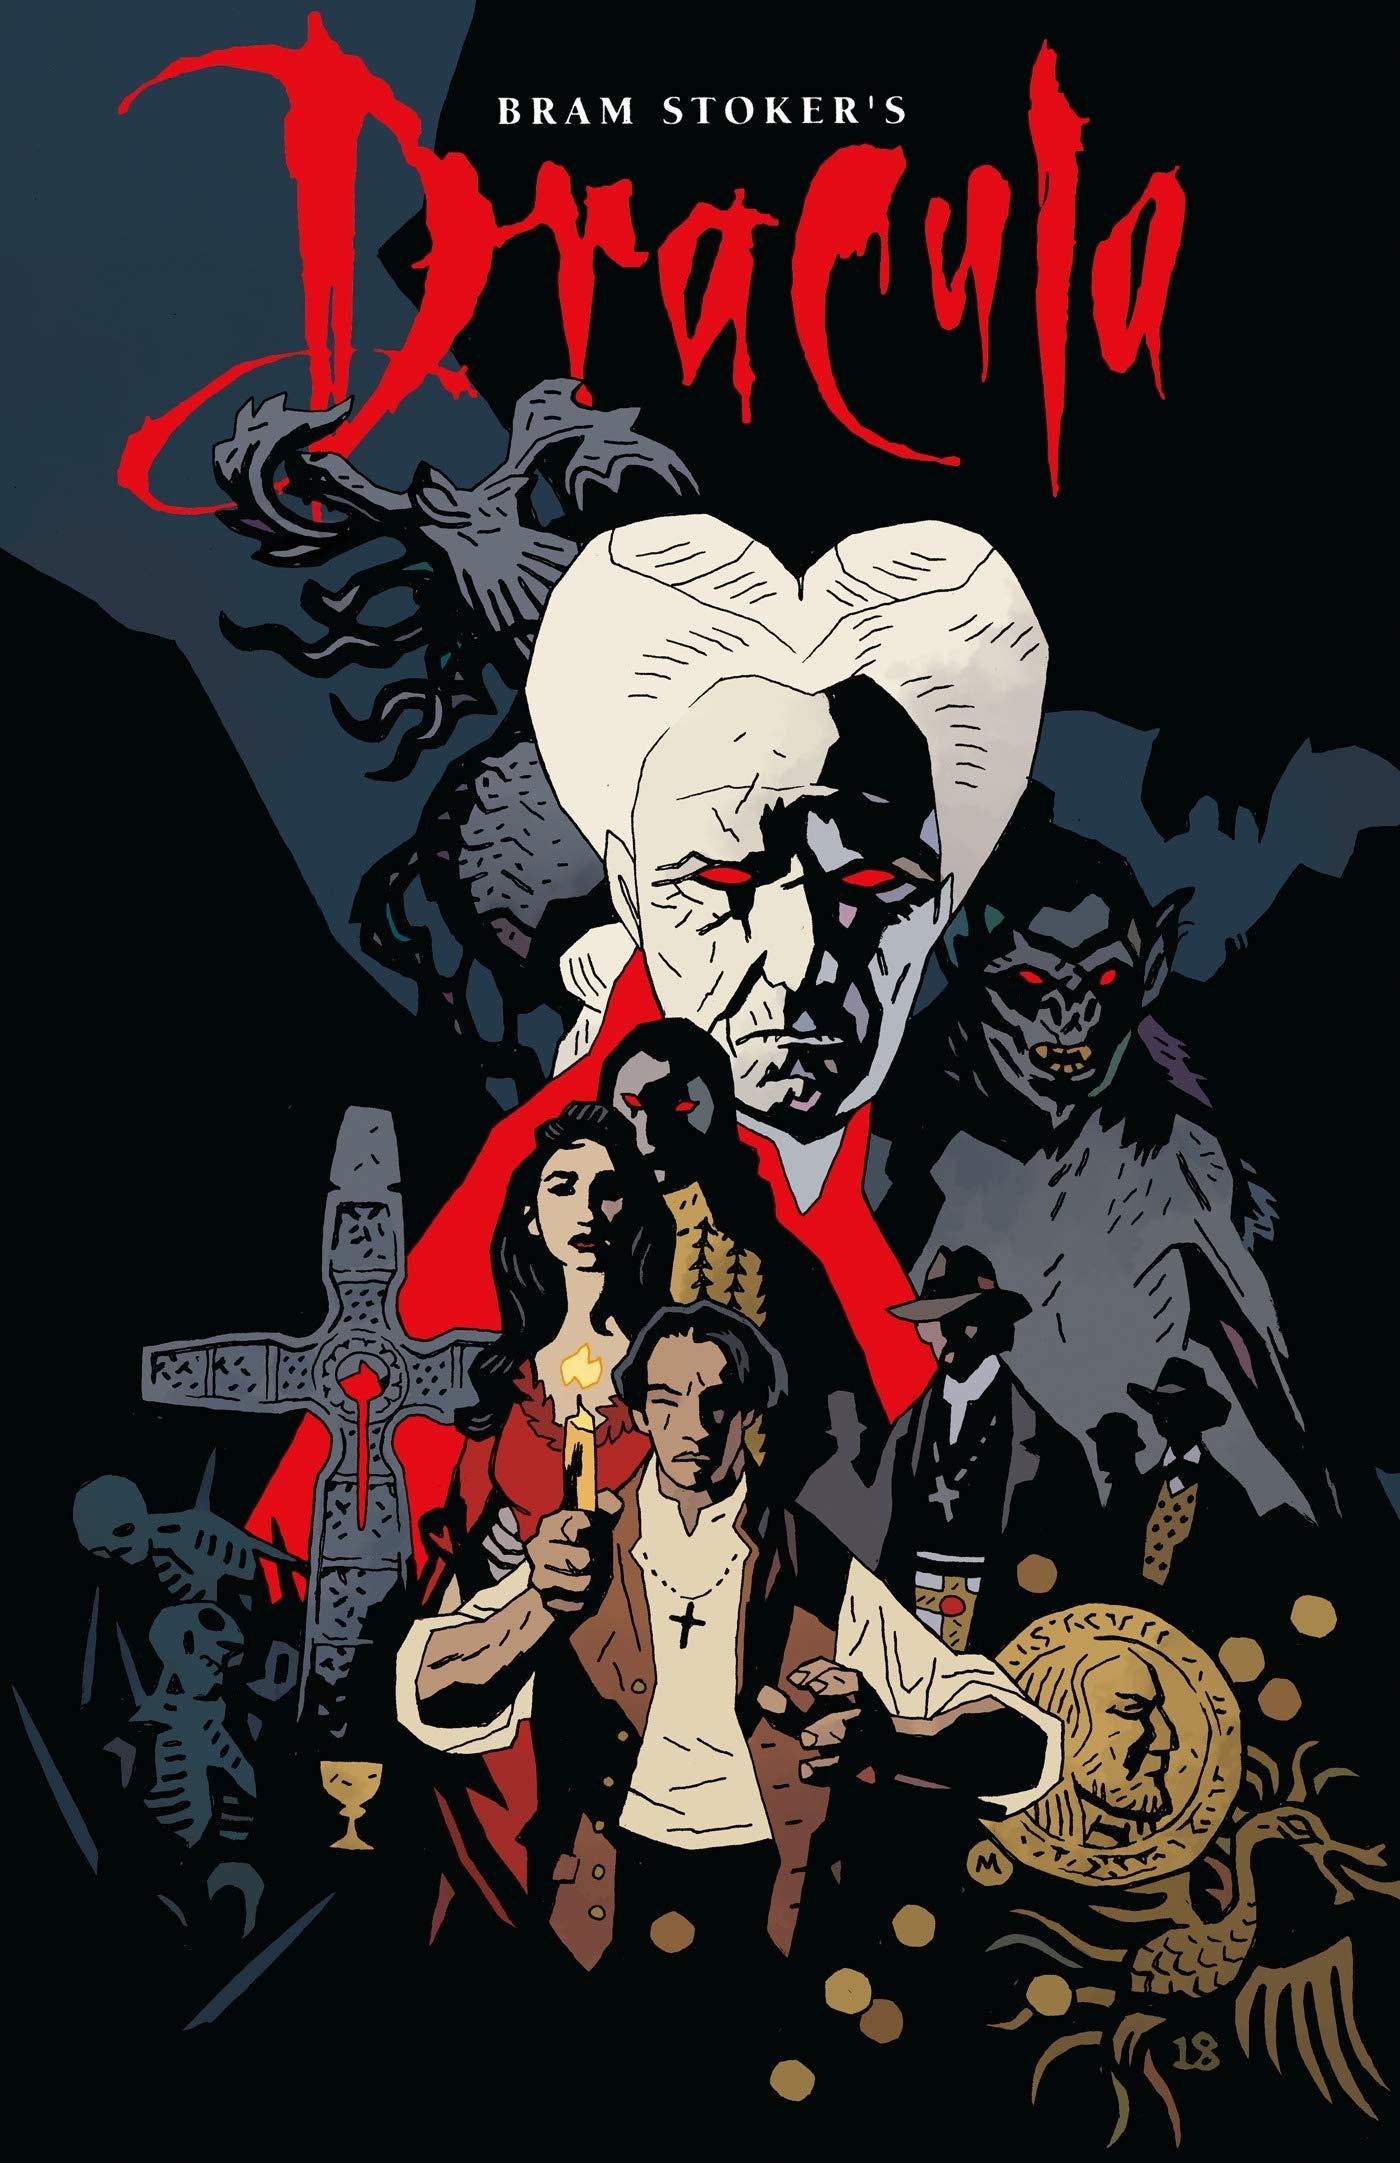 Bram Stokers Dracula Graphic Novel Paperback July 16 2019